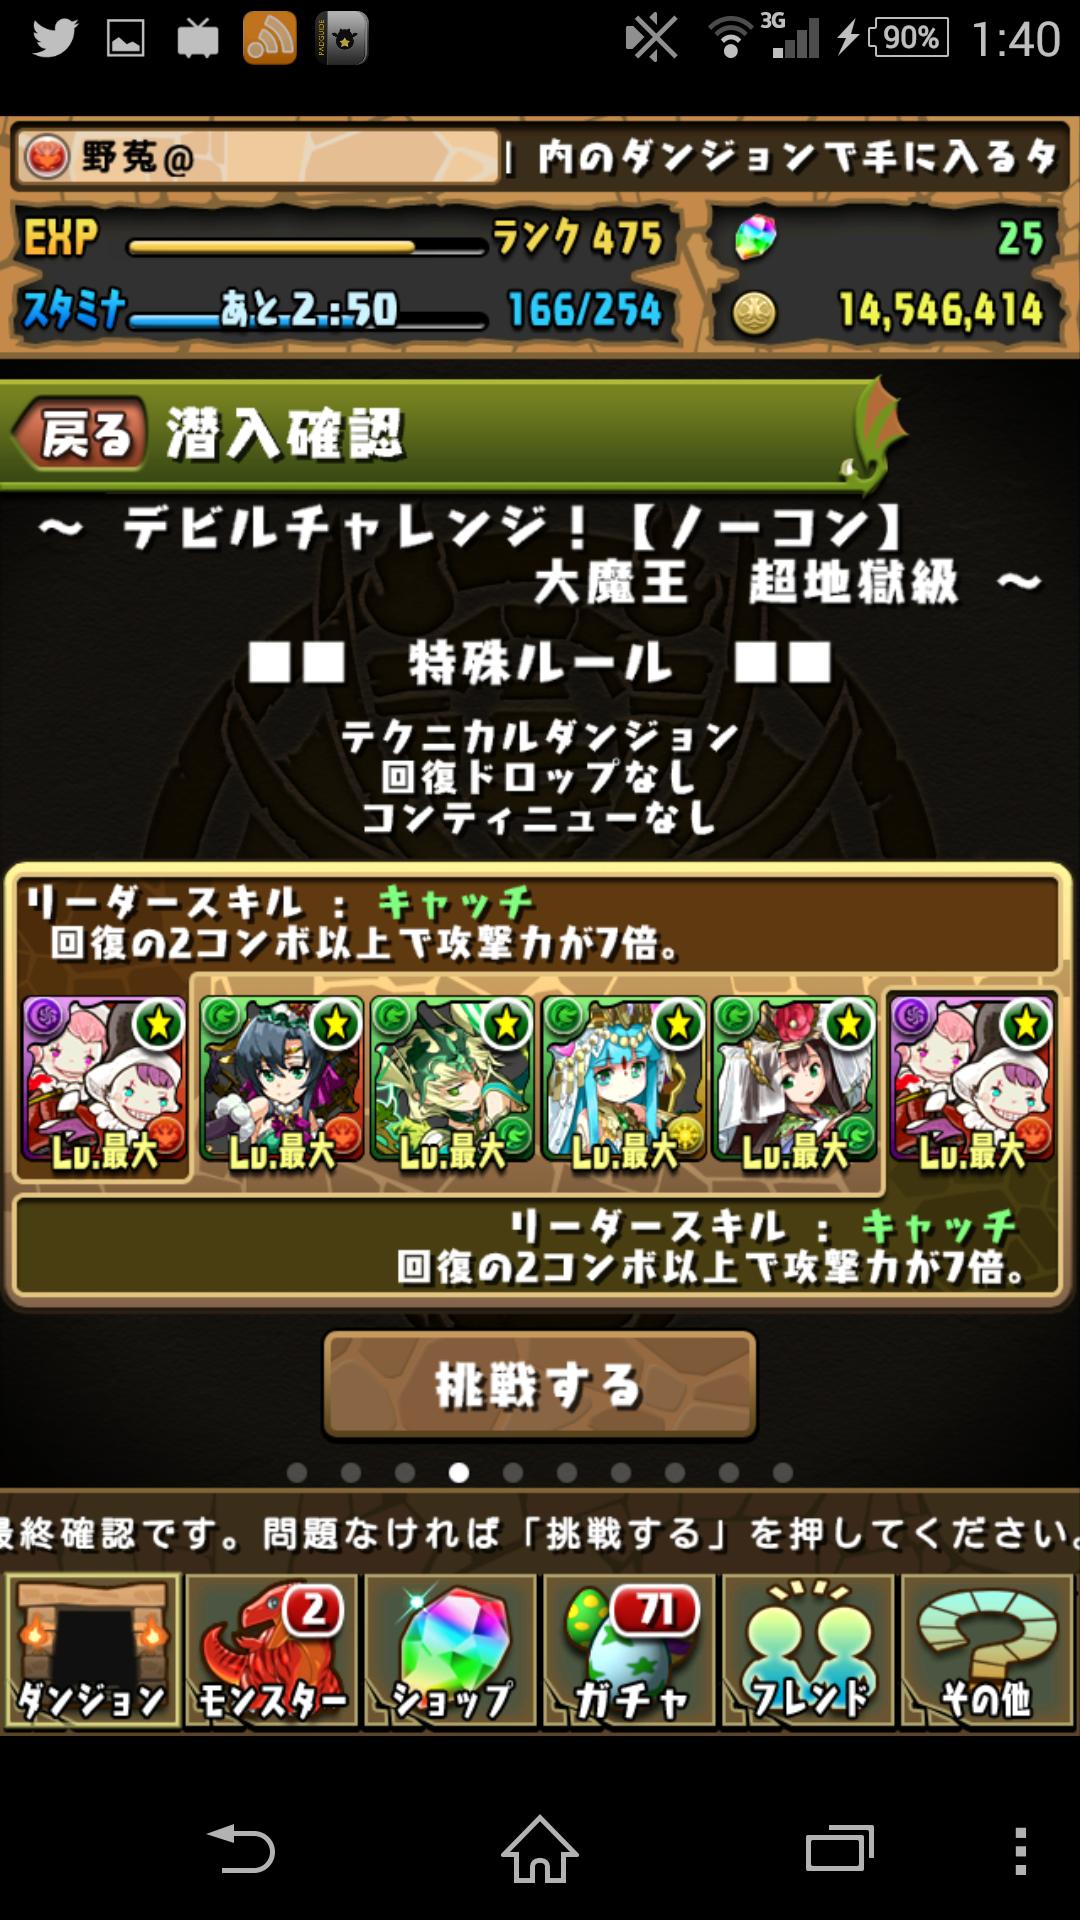 Screenshot_2015-03-04-01-40-23.png